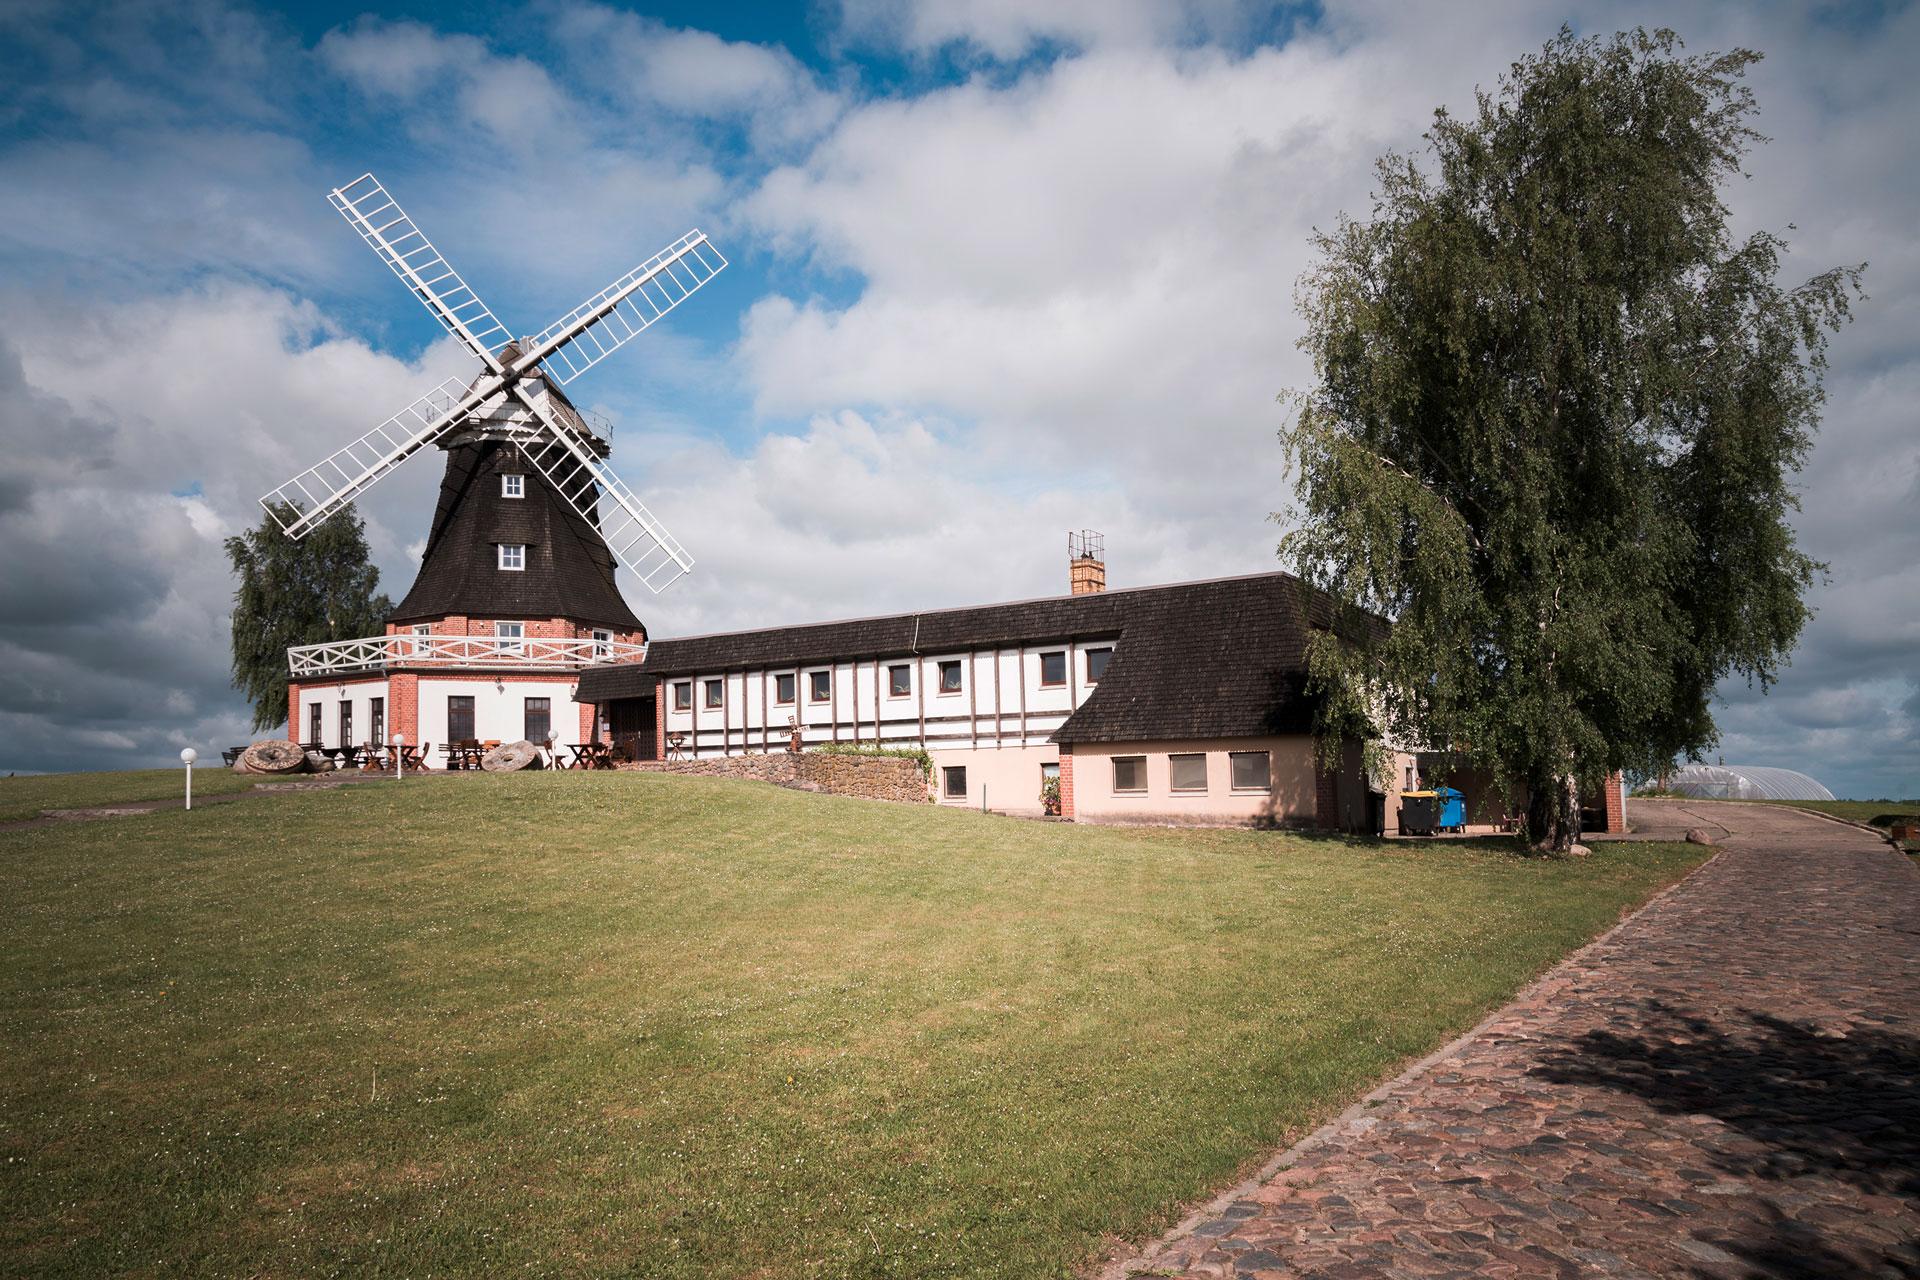 Mühle im Landkreis NWM / Totale